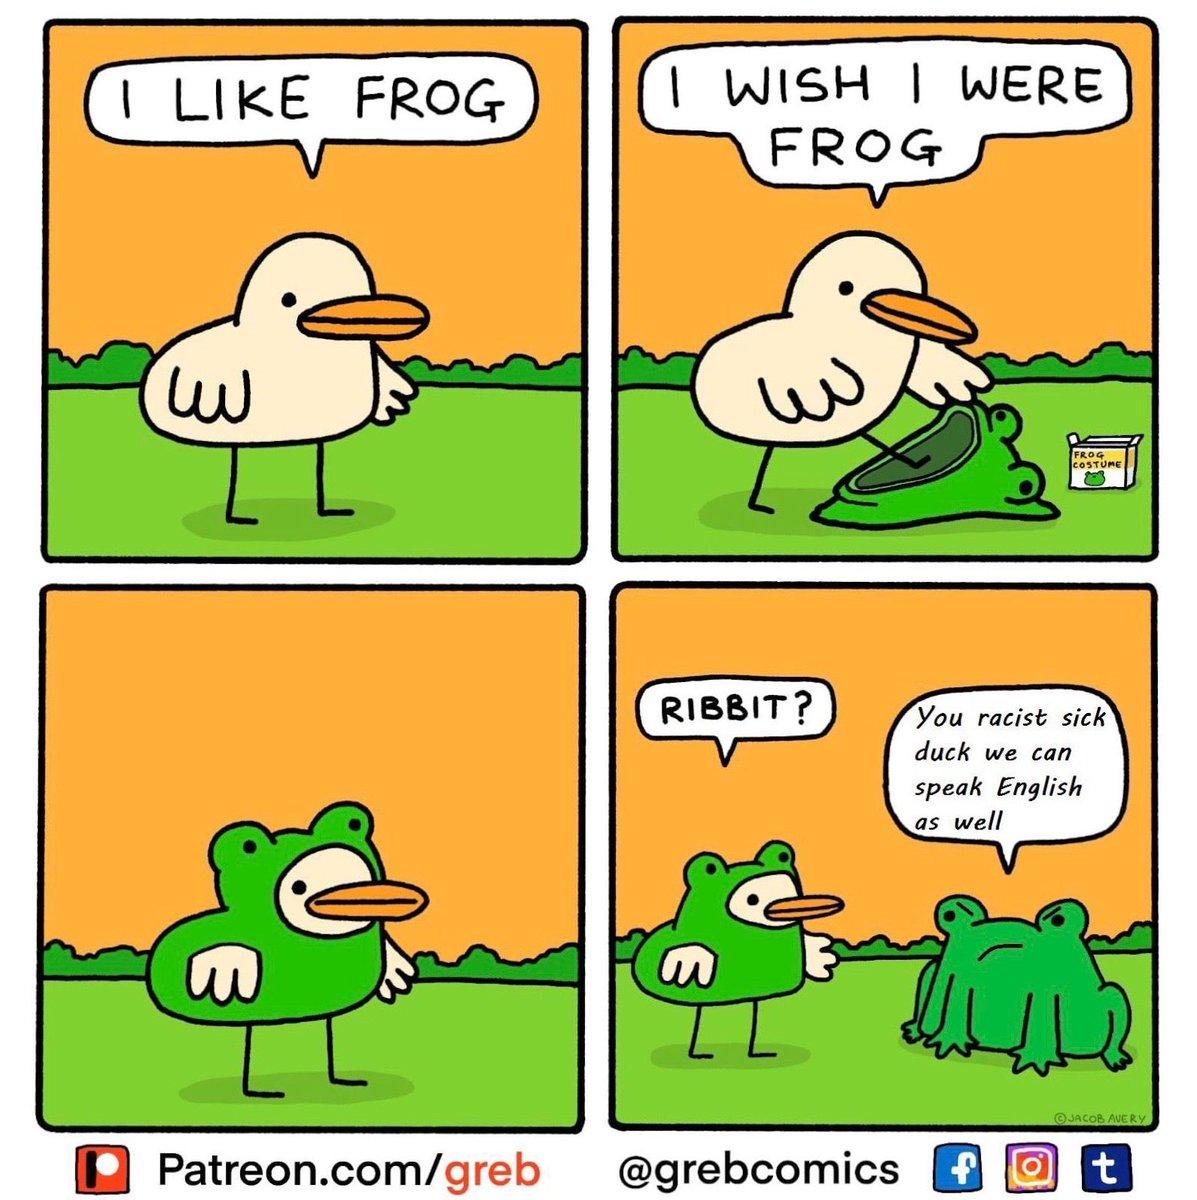 Follow @commedy_necromancy @grebcomics . . . . . #dankmemes #dankmemesdaily #edgymemes  #memes #funny #memesquad #memesdaily #instagood #bruh #epicmemes #babyyoda #spicy #cursedimage #bruh #deepfriedmemes #spicymemes #chadmemes #comic #frog #duck #duckmemes #grebcomics #ribbitpic.twitter.com/kbxQja2XEj